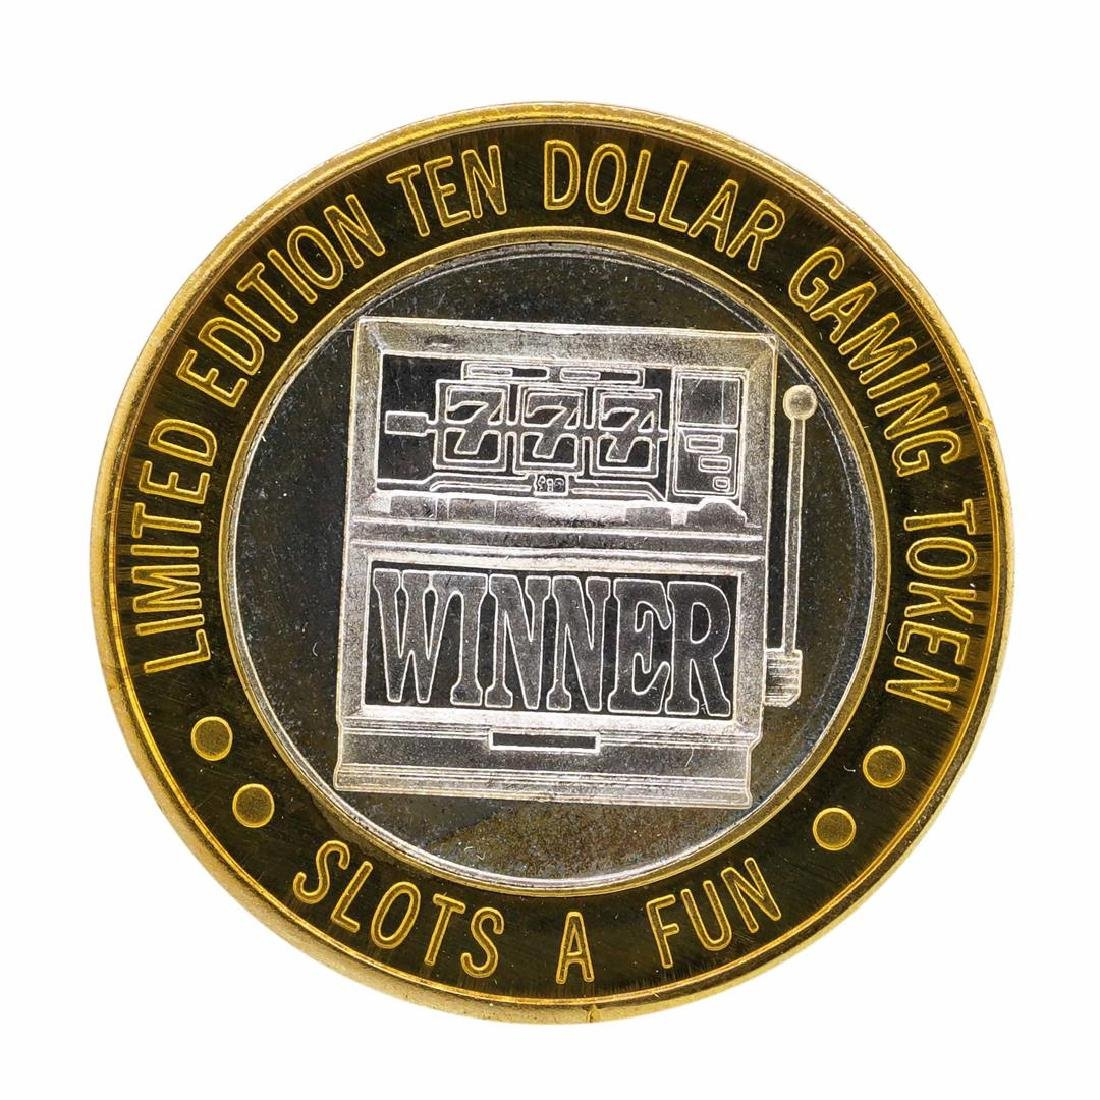 .999 Silver Slots - A - Fun Las Vegas, Nevada $10